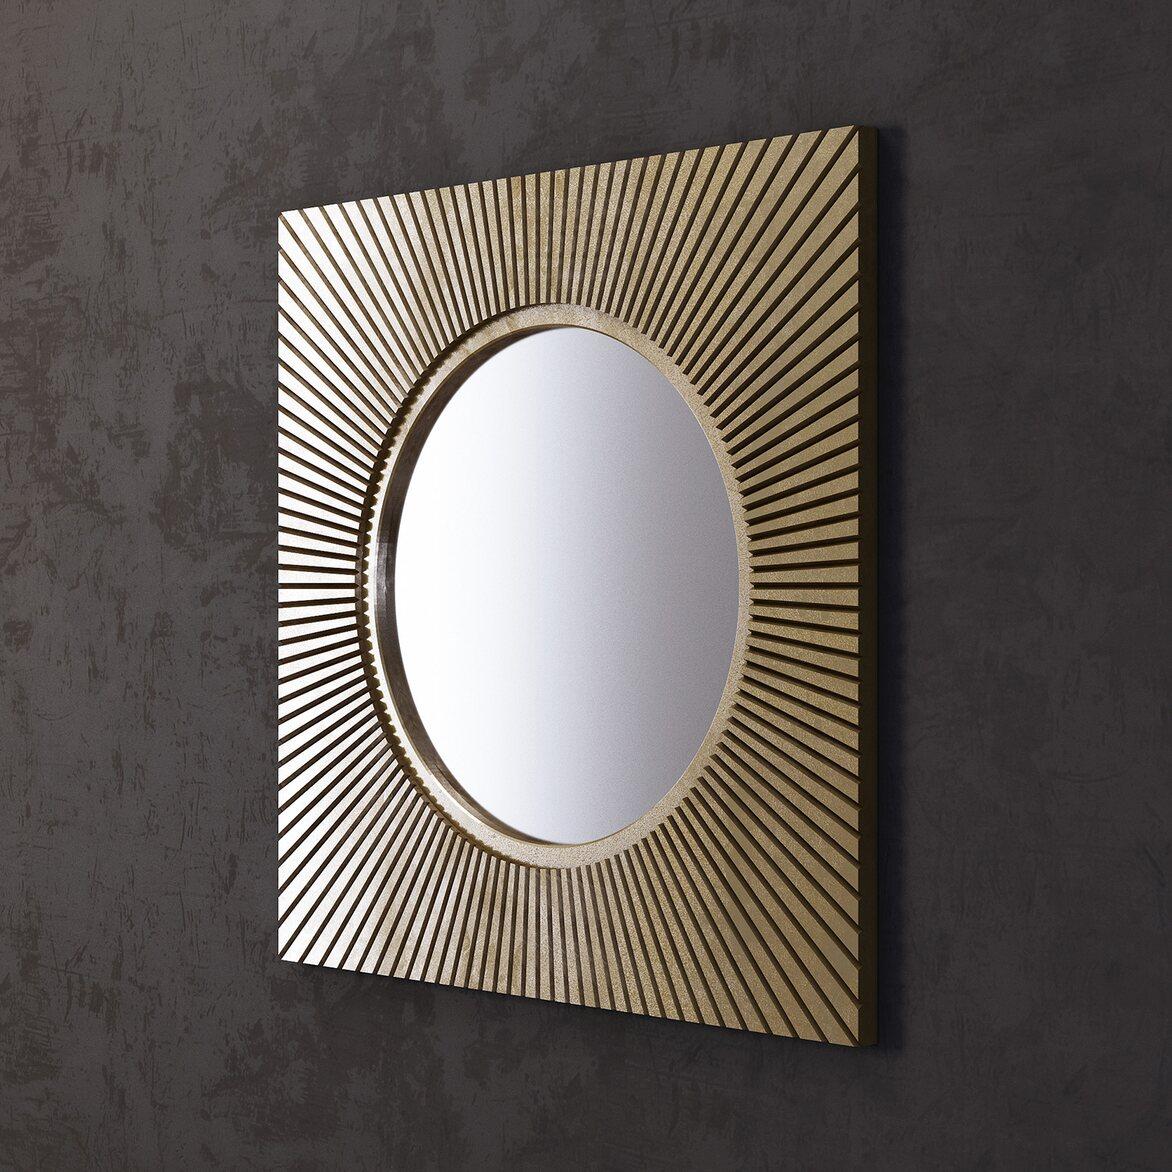 Зеркало Sunshine, квадратное 2 | Настенные зеркала Kingsby